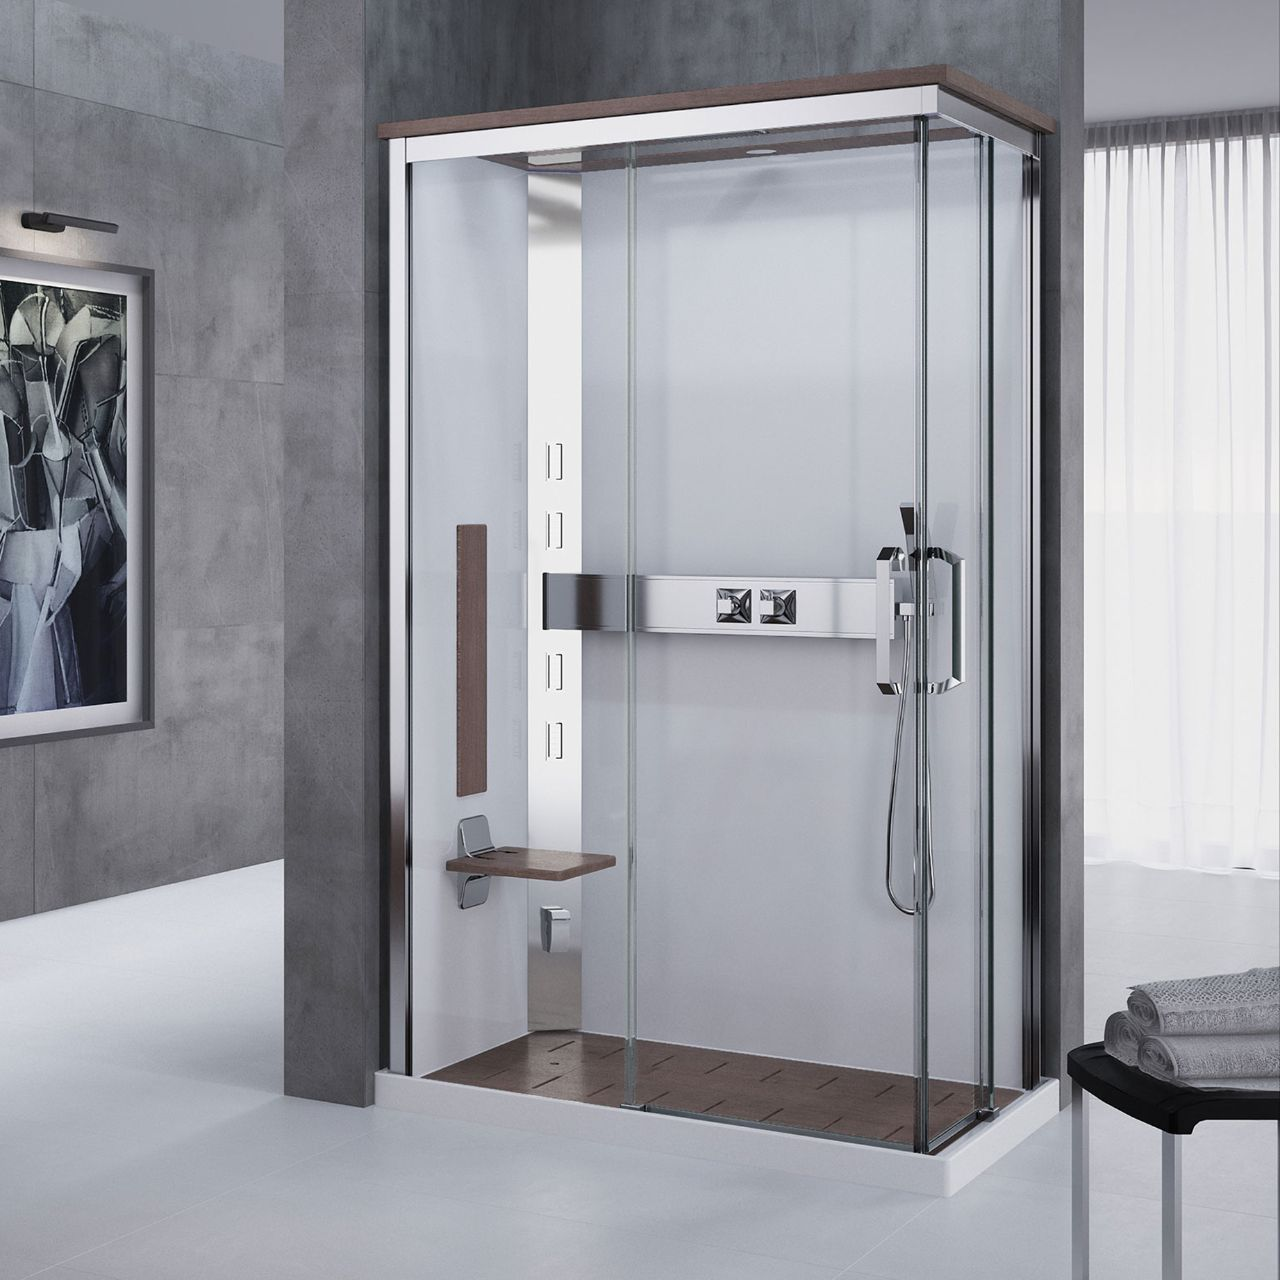 komplettduschen nexis a120x80 novellini. Black Bedroom Furniture Sets. Home Design Ideas